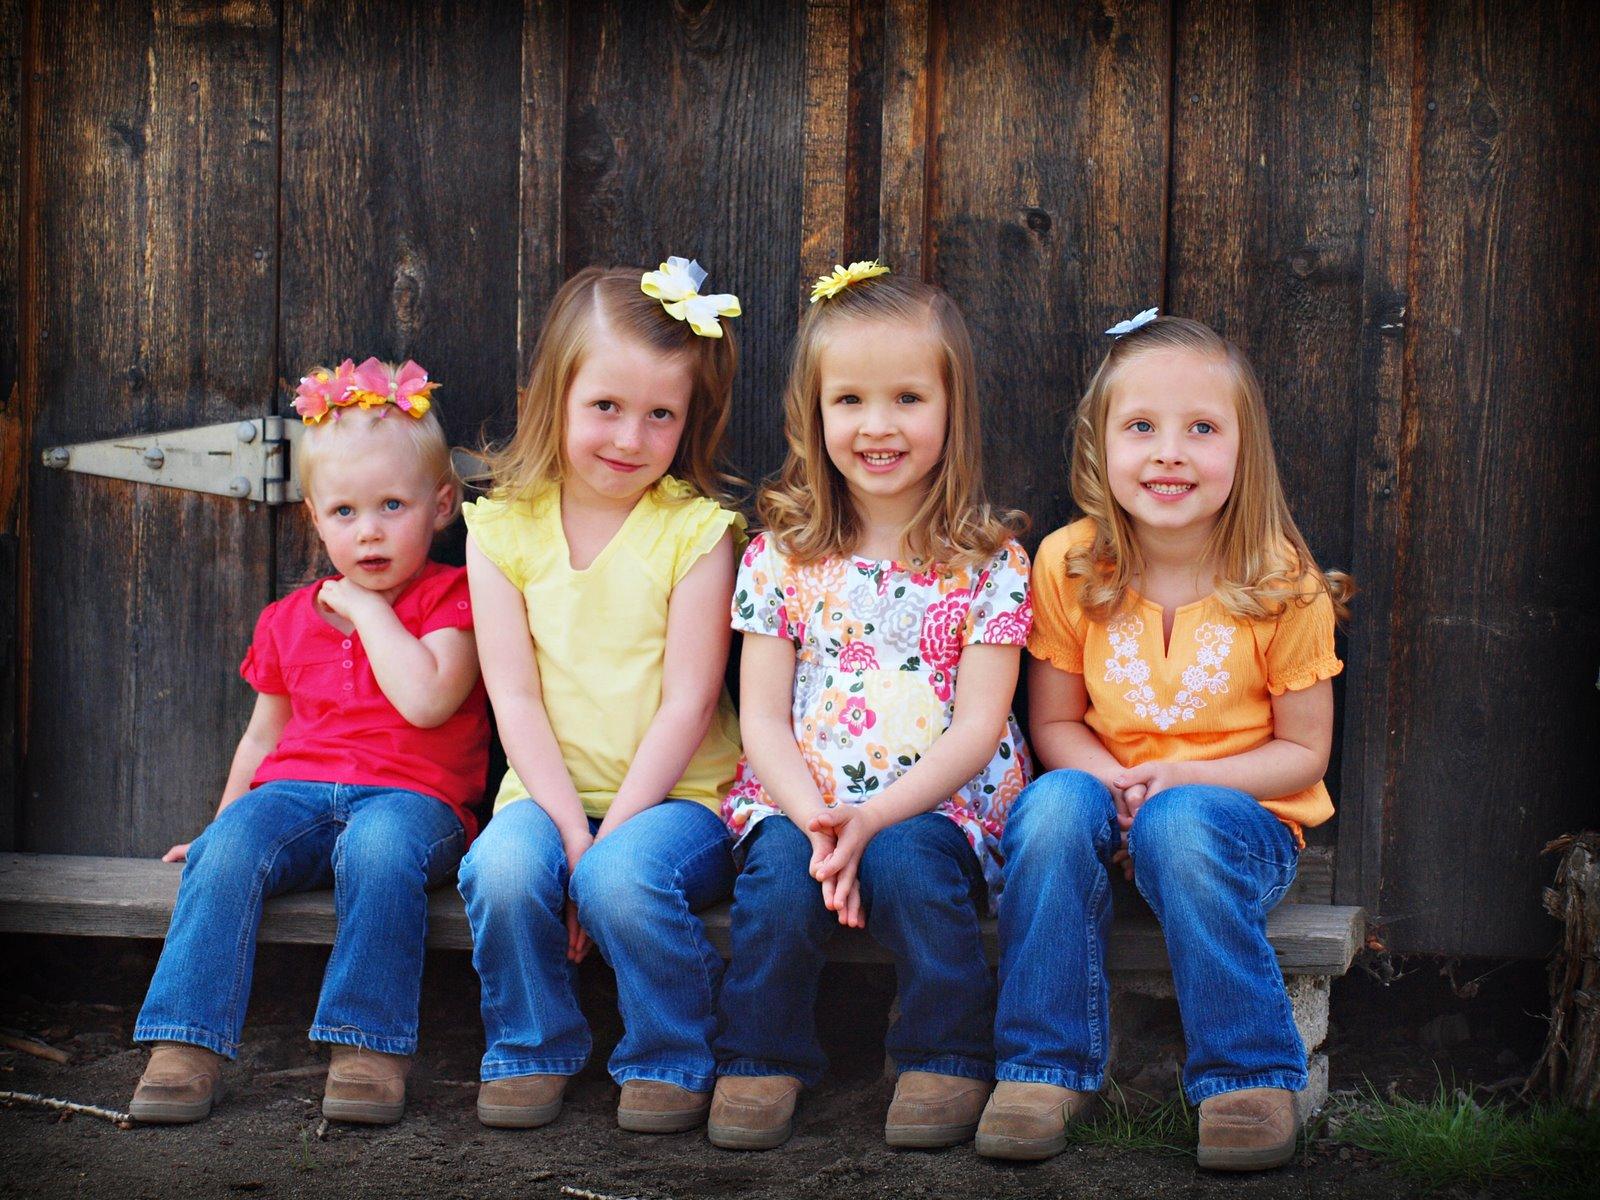 essay on four little girls